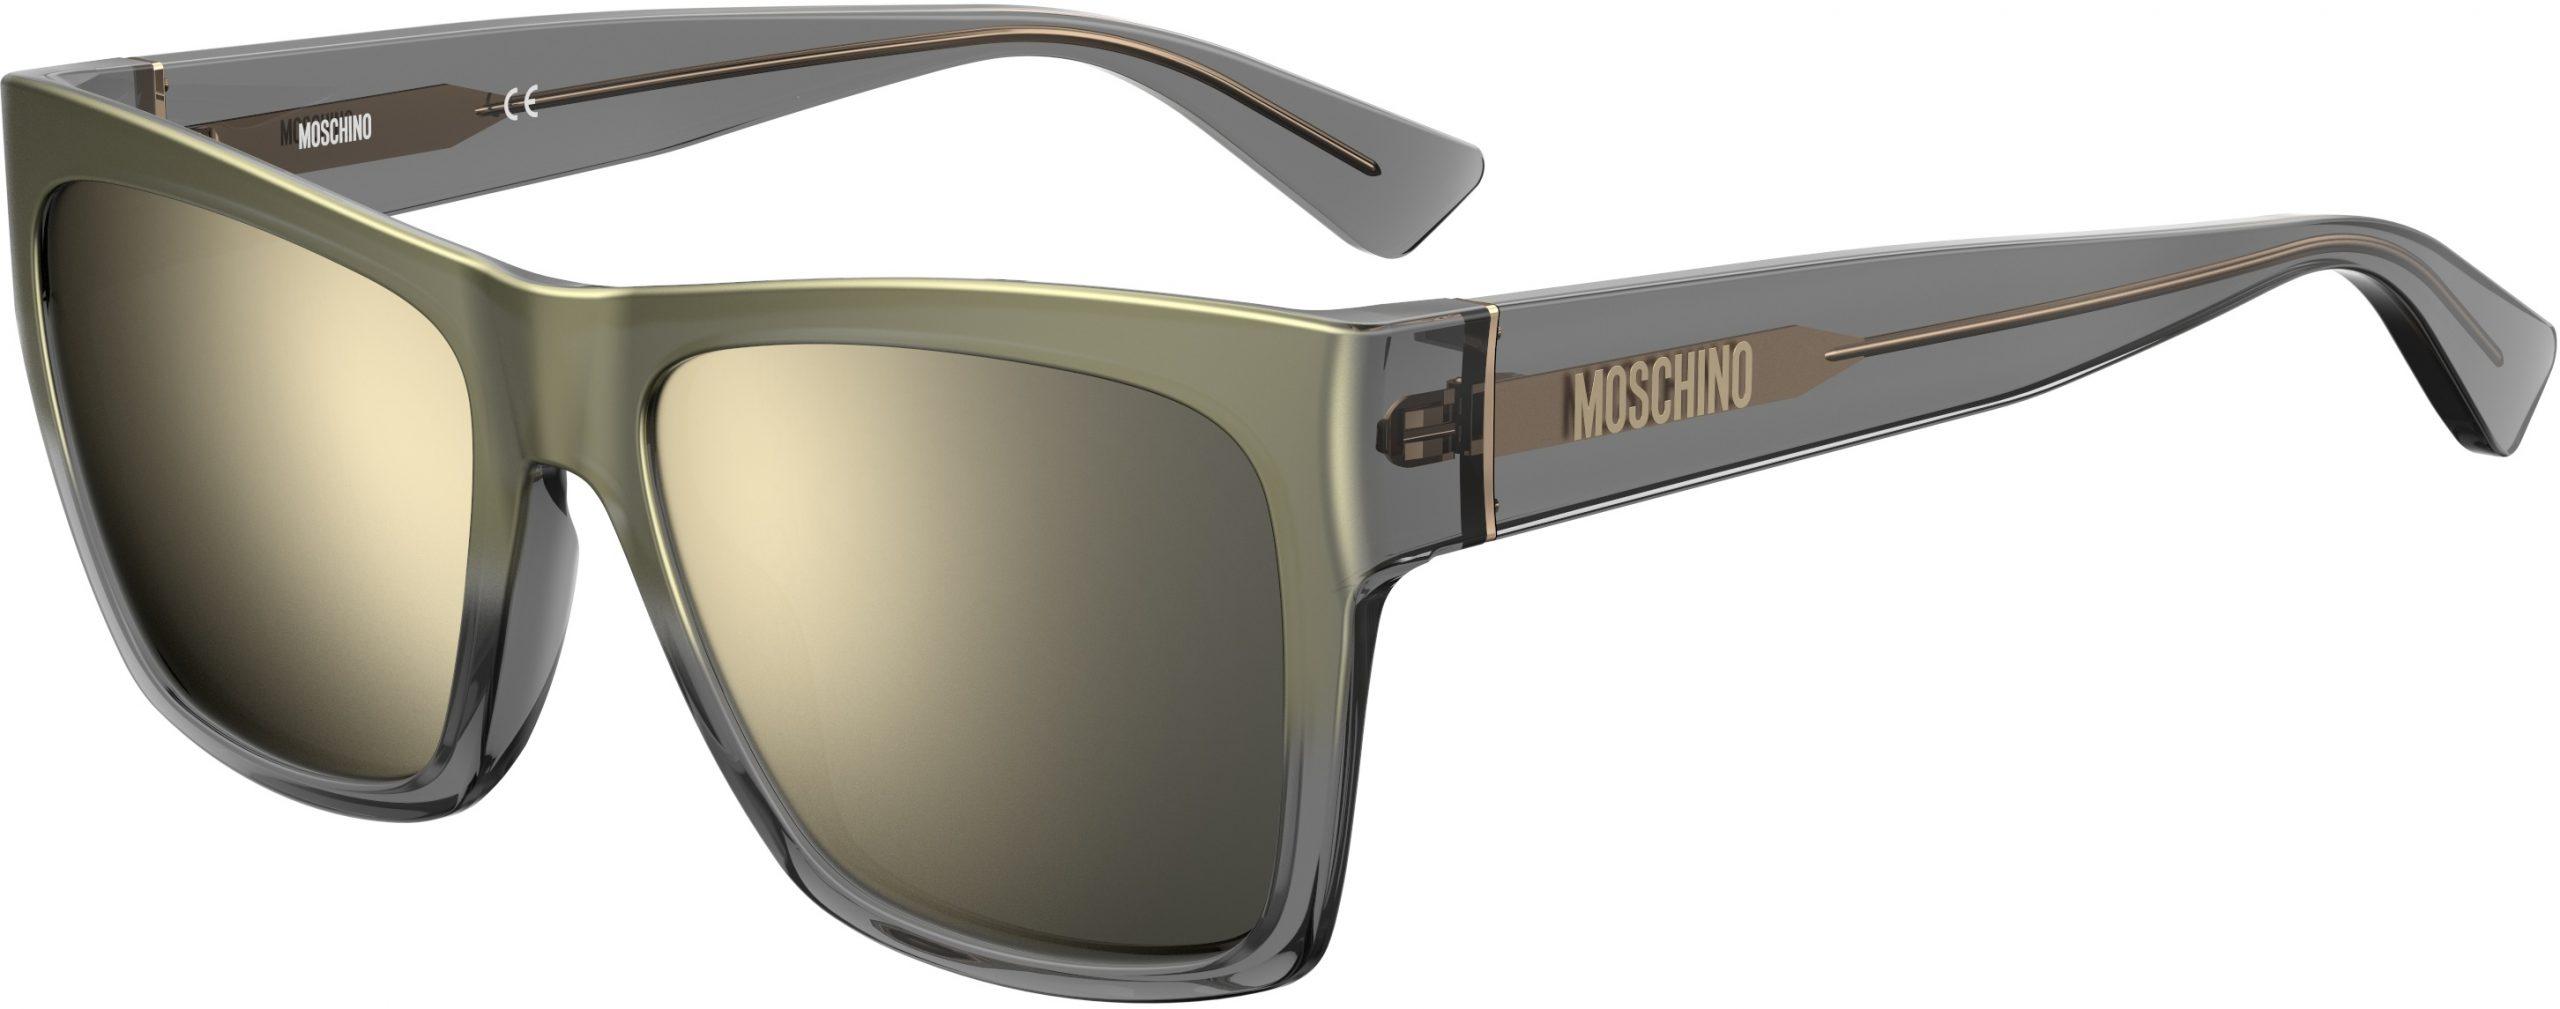 Moschino MOS064/S 202707-KB7/UE-56 | 716736220192